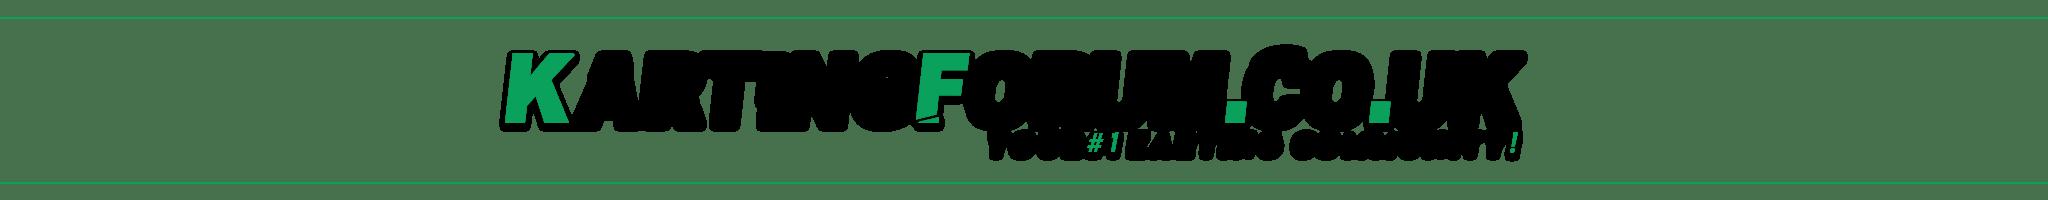 KartingForum.co.uk